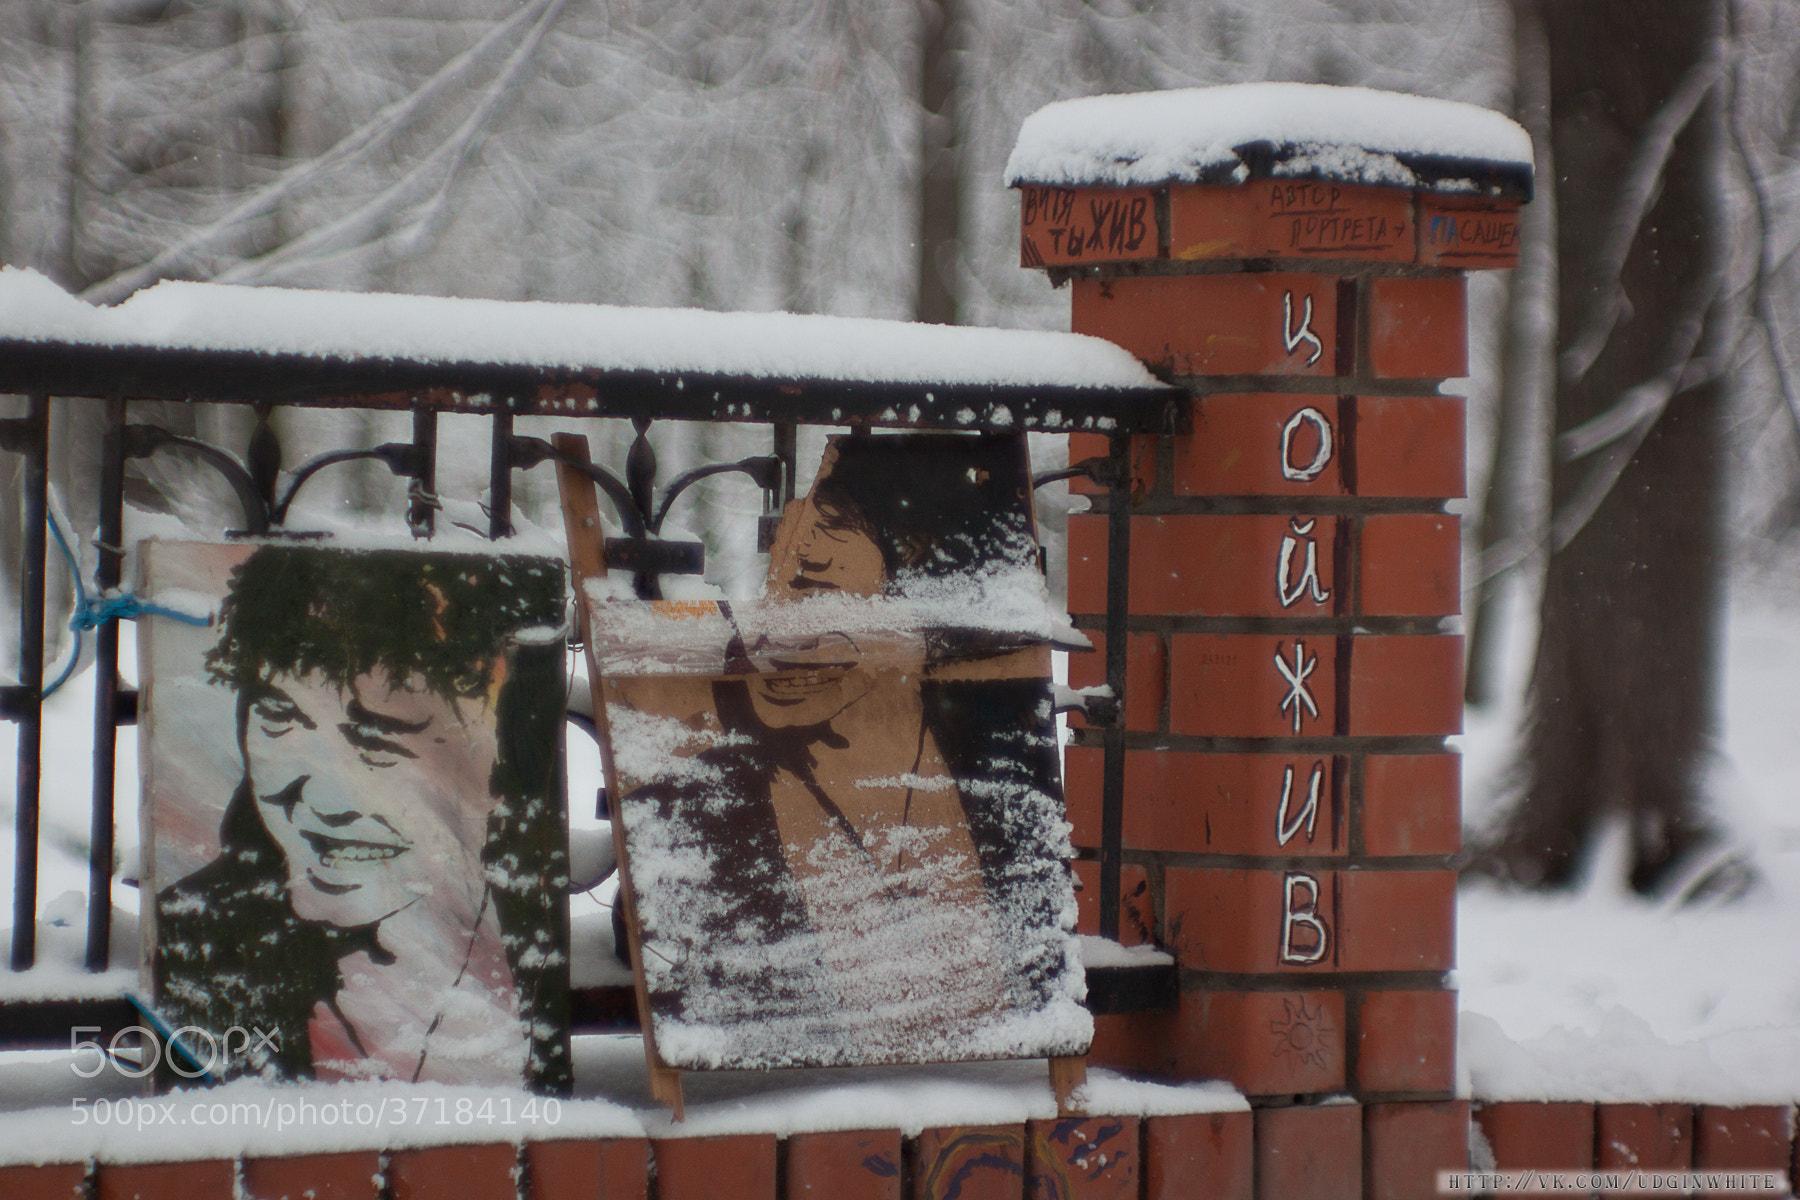 Photograph памяти Виктора Цоя (Viktor Tsoi) by Evgeny Belyaev on 500px